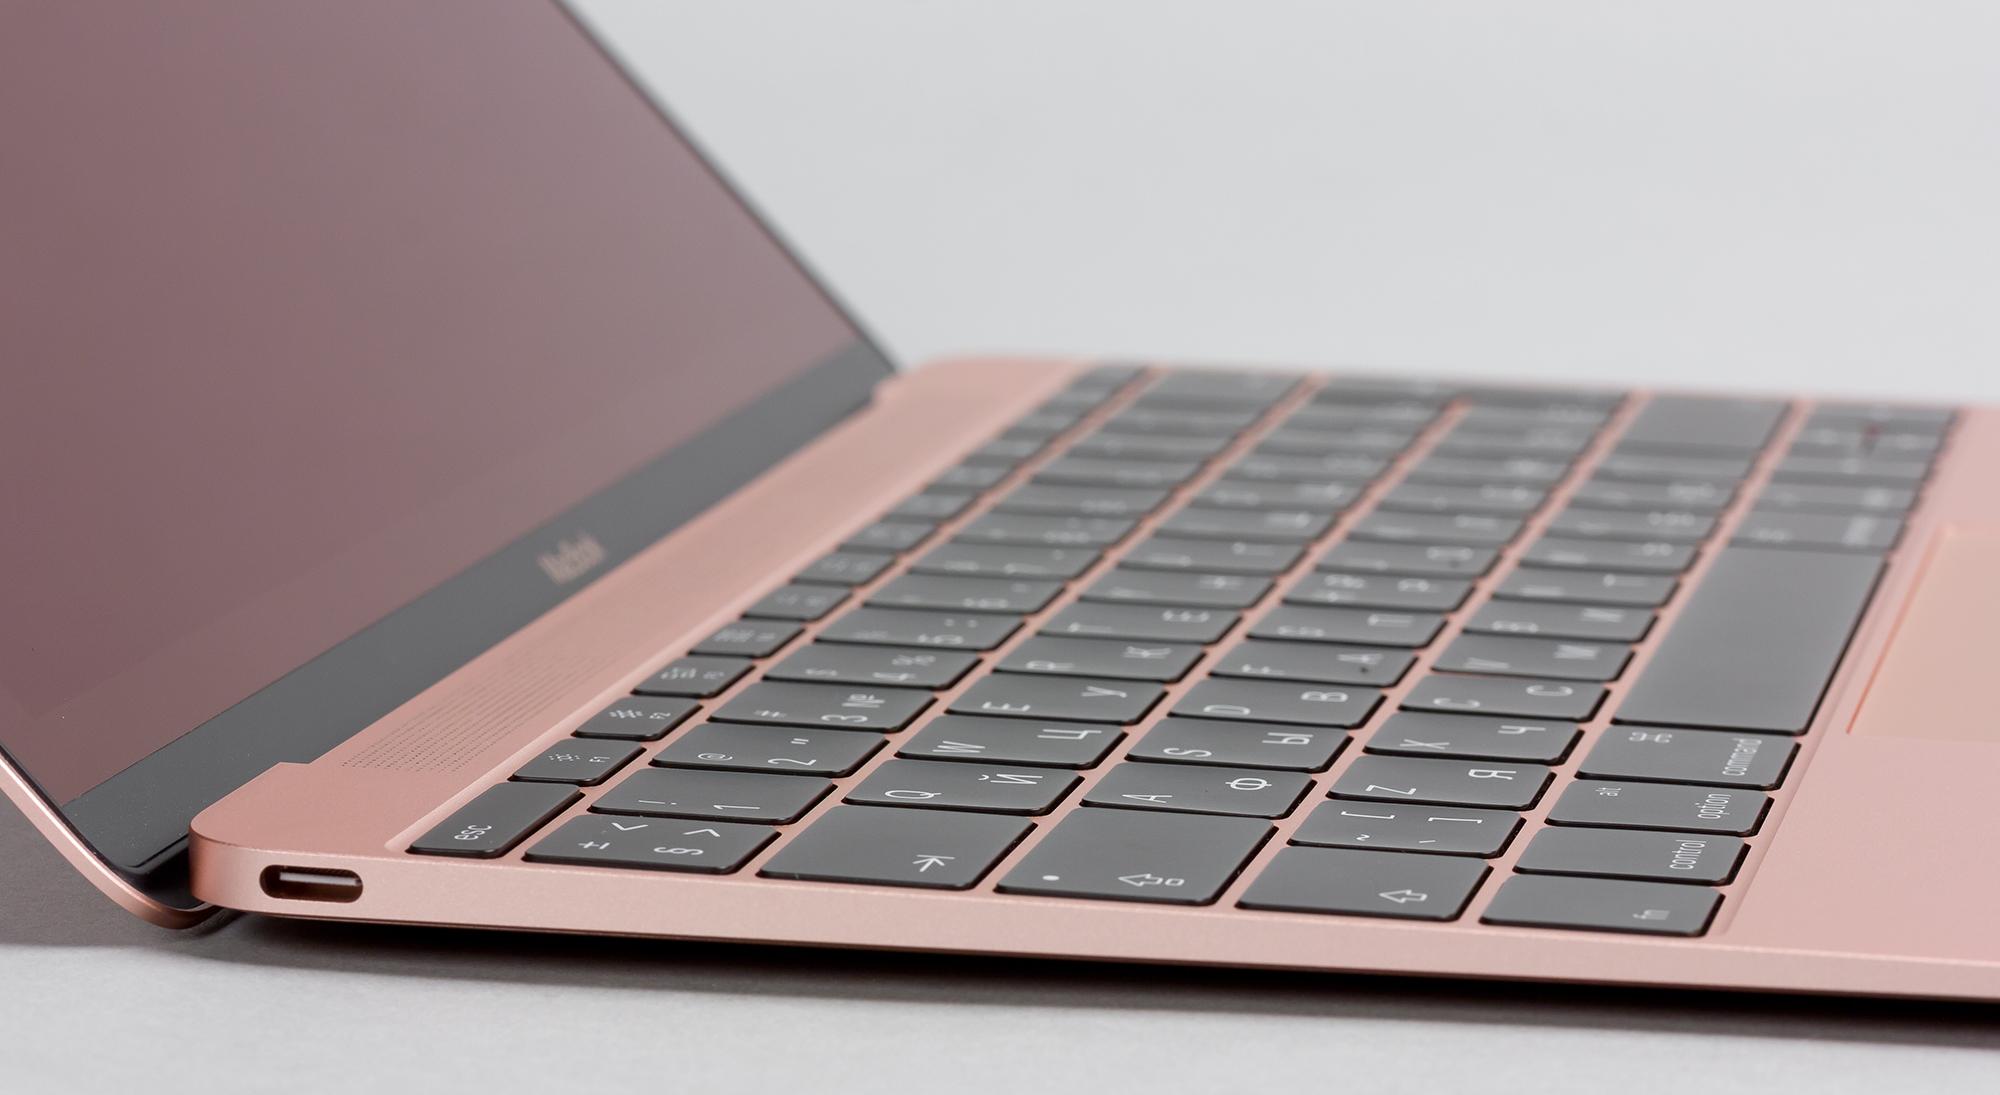 Обзор 12-дюймового MacBook (2016) - клавиатура